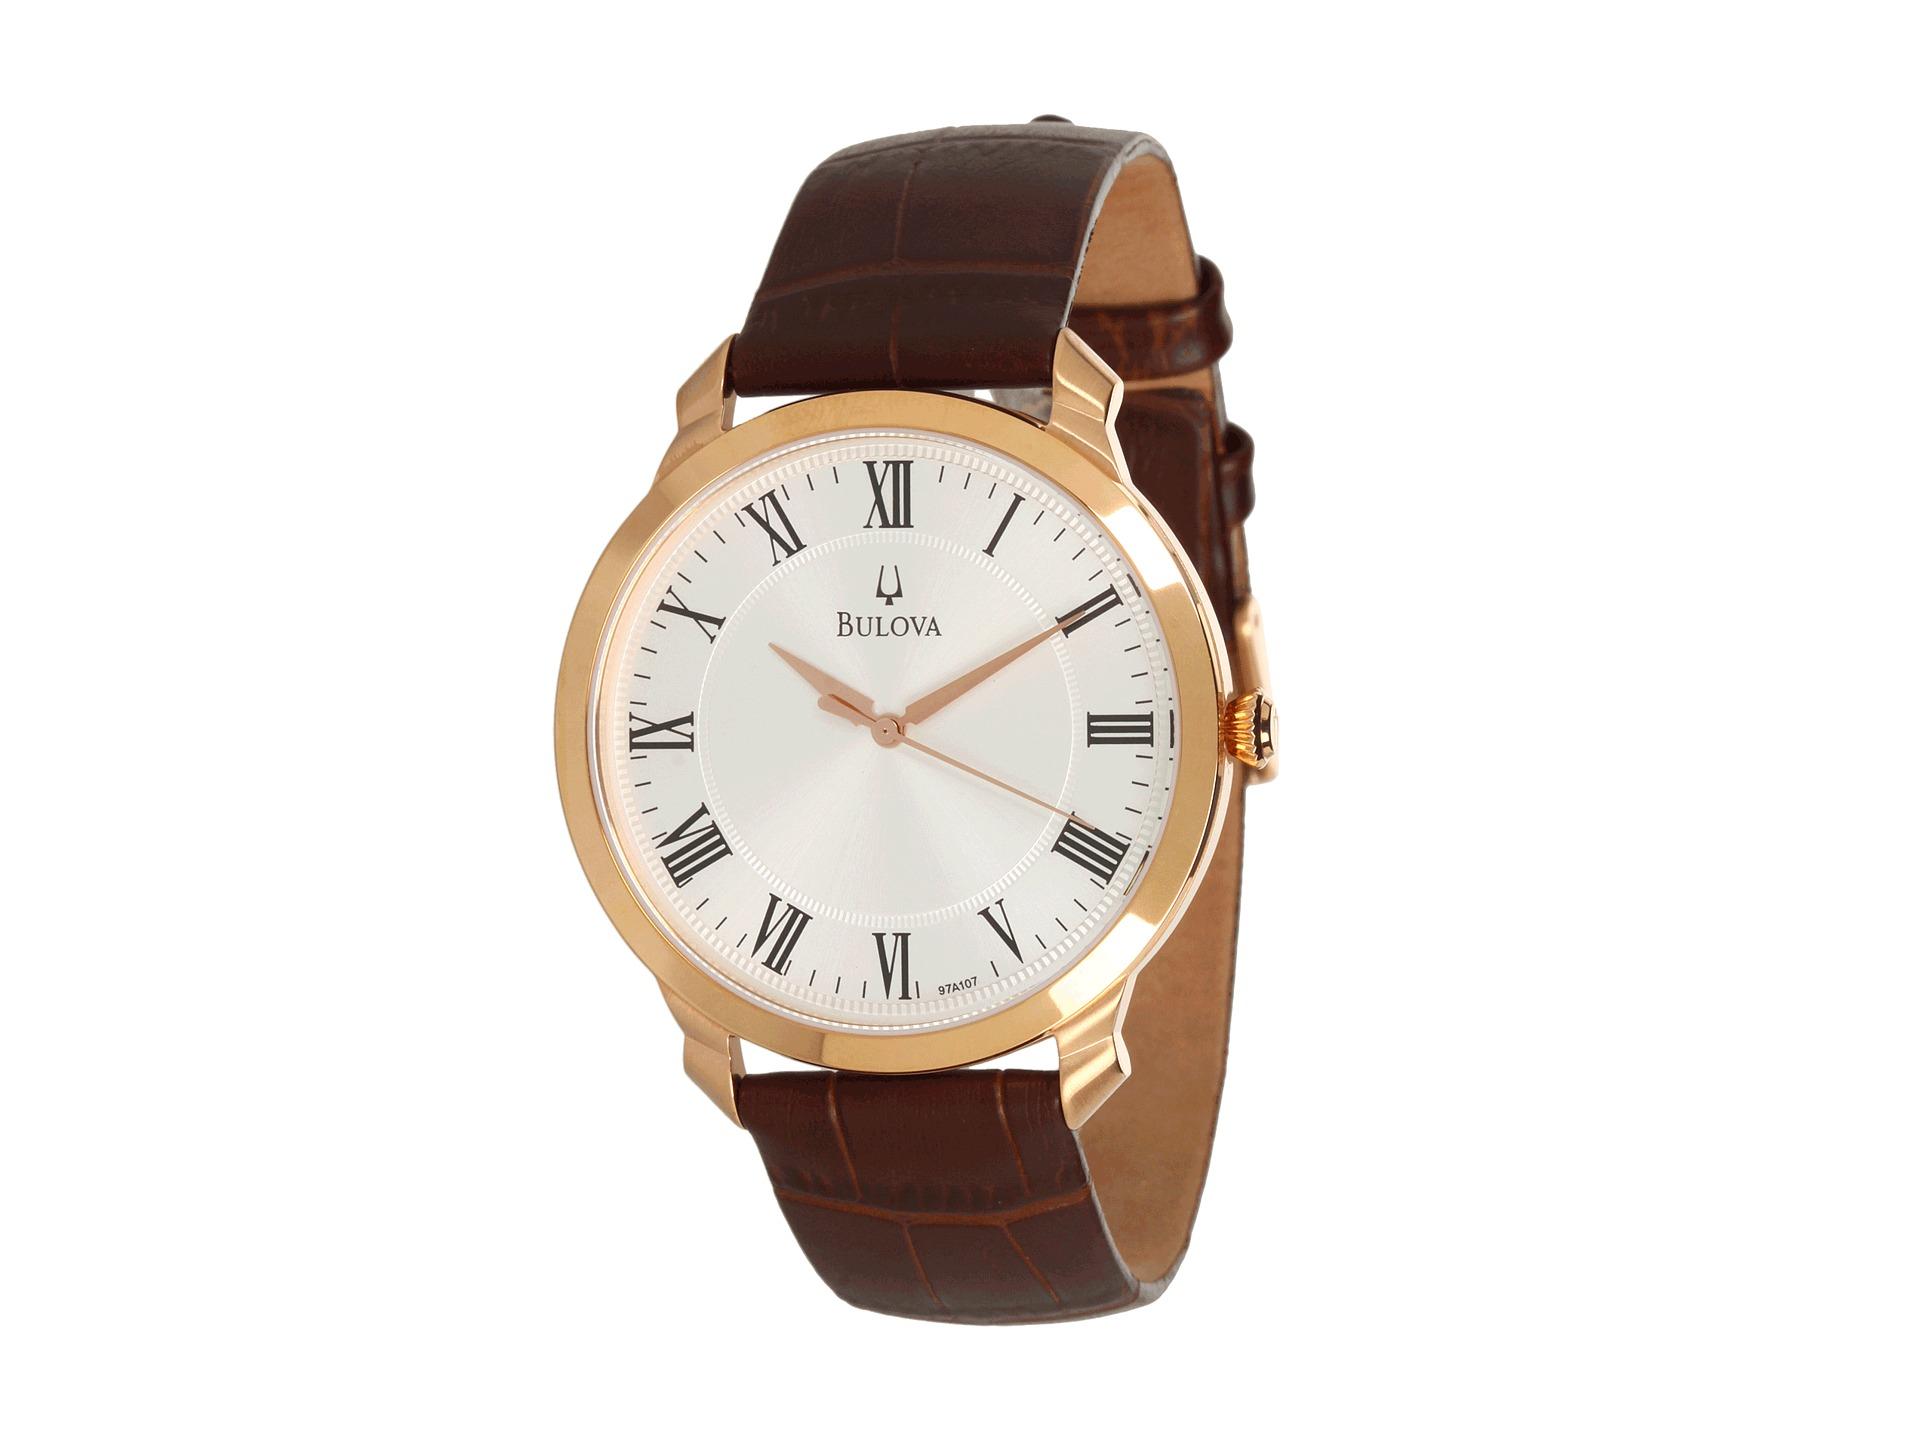 Bulova Watches - Certified Watch Store